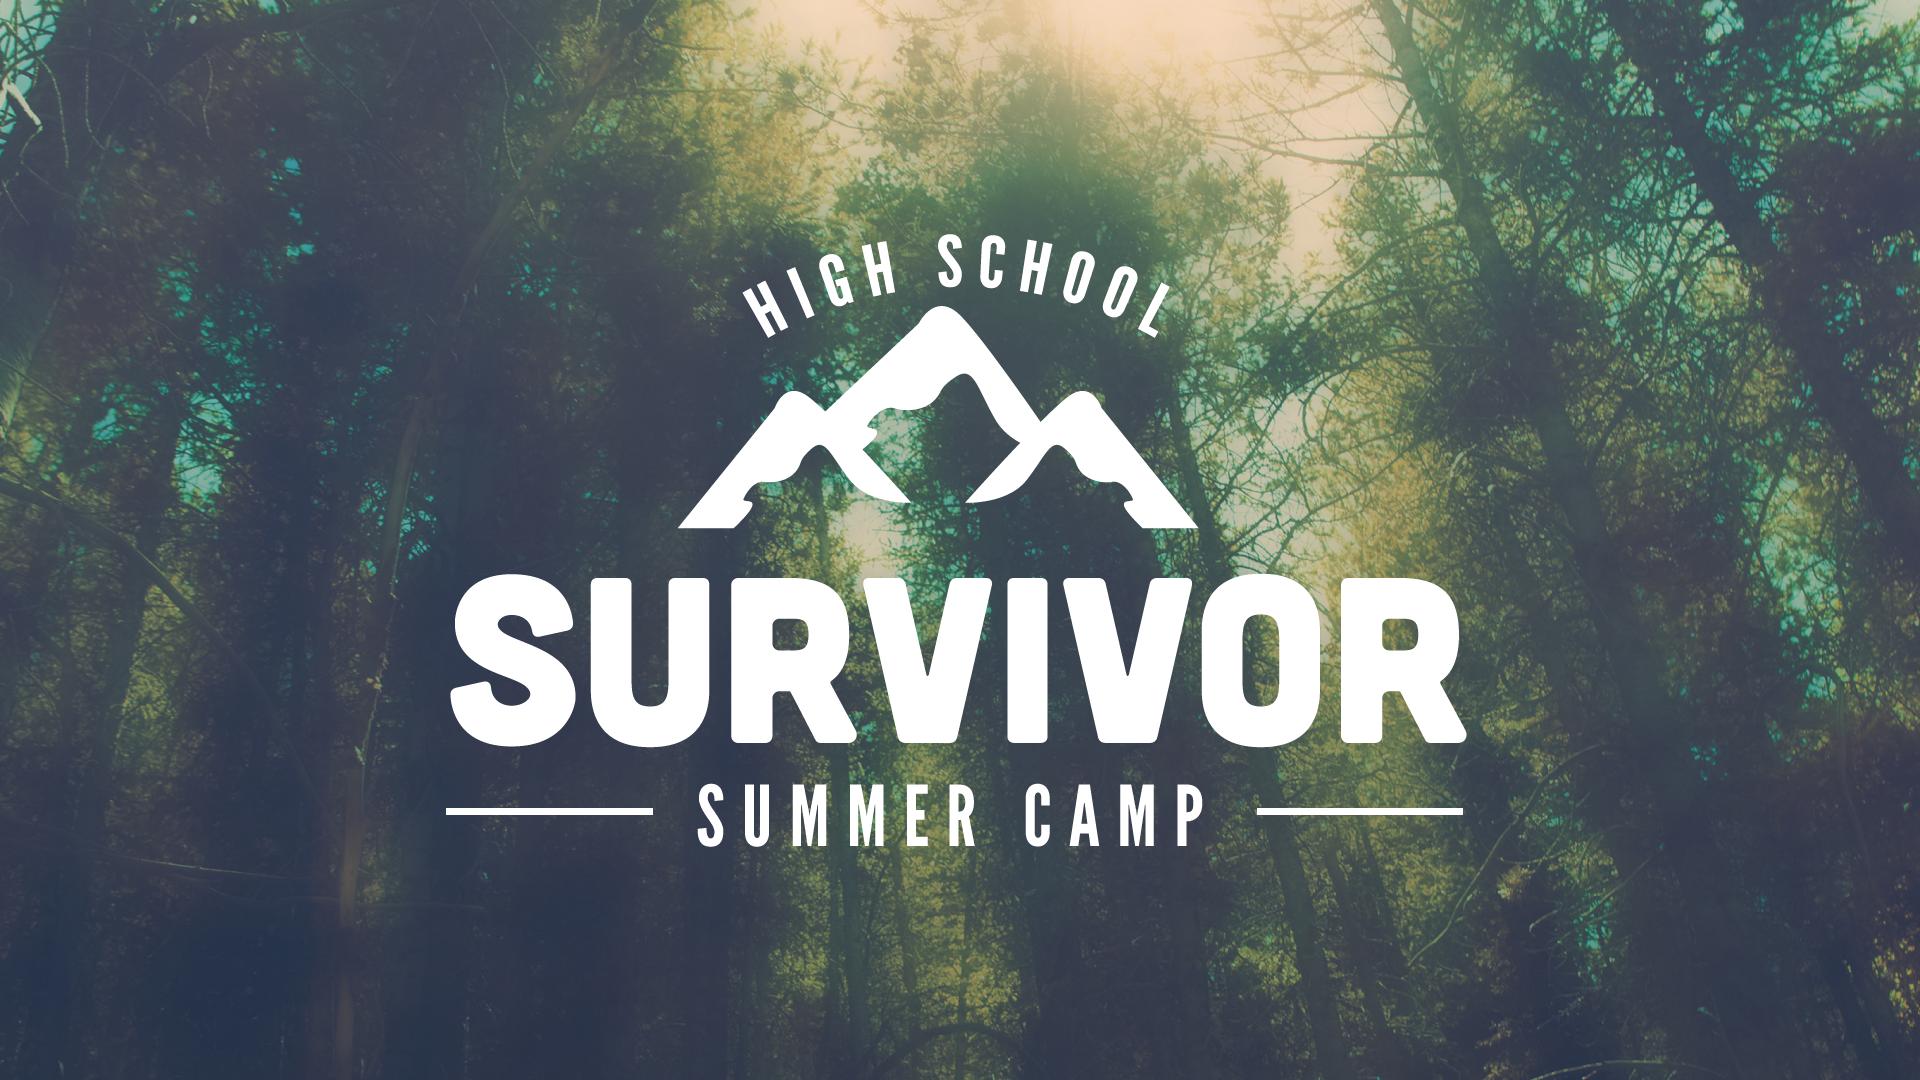 High school survivor camp blank